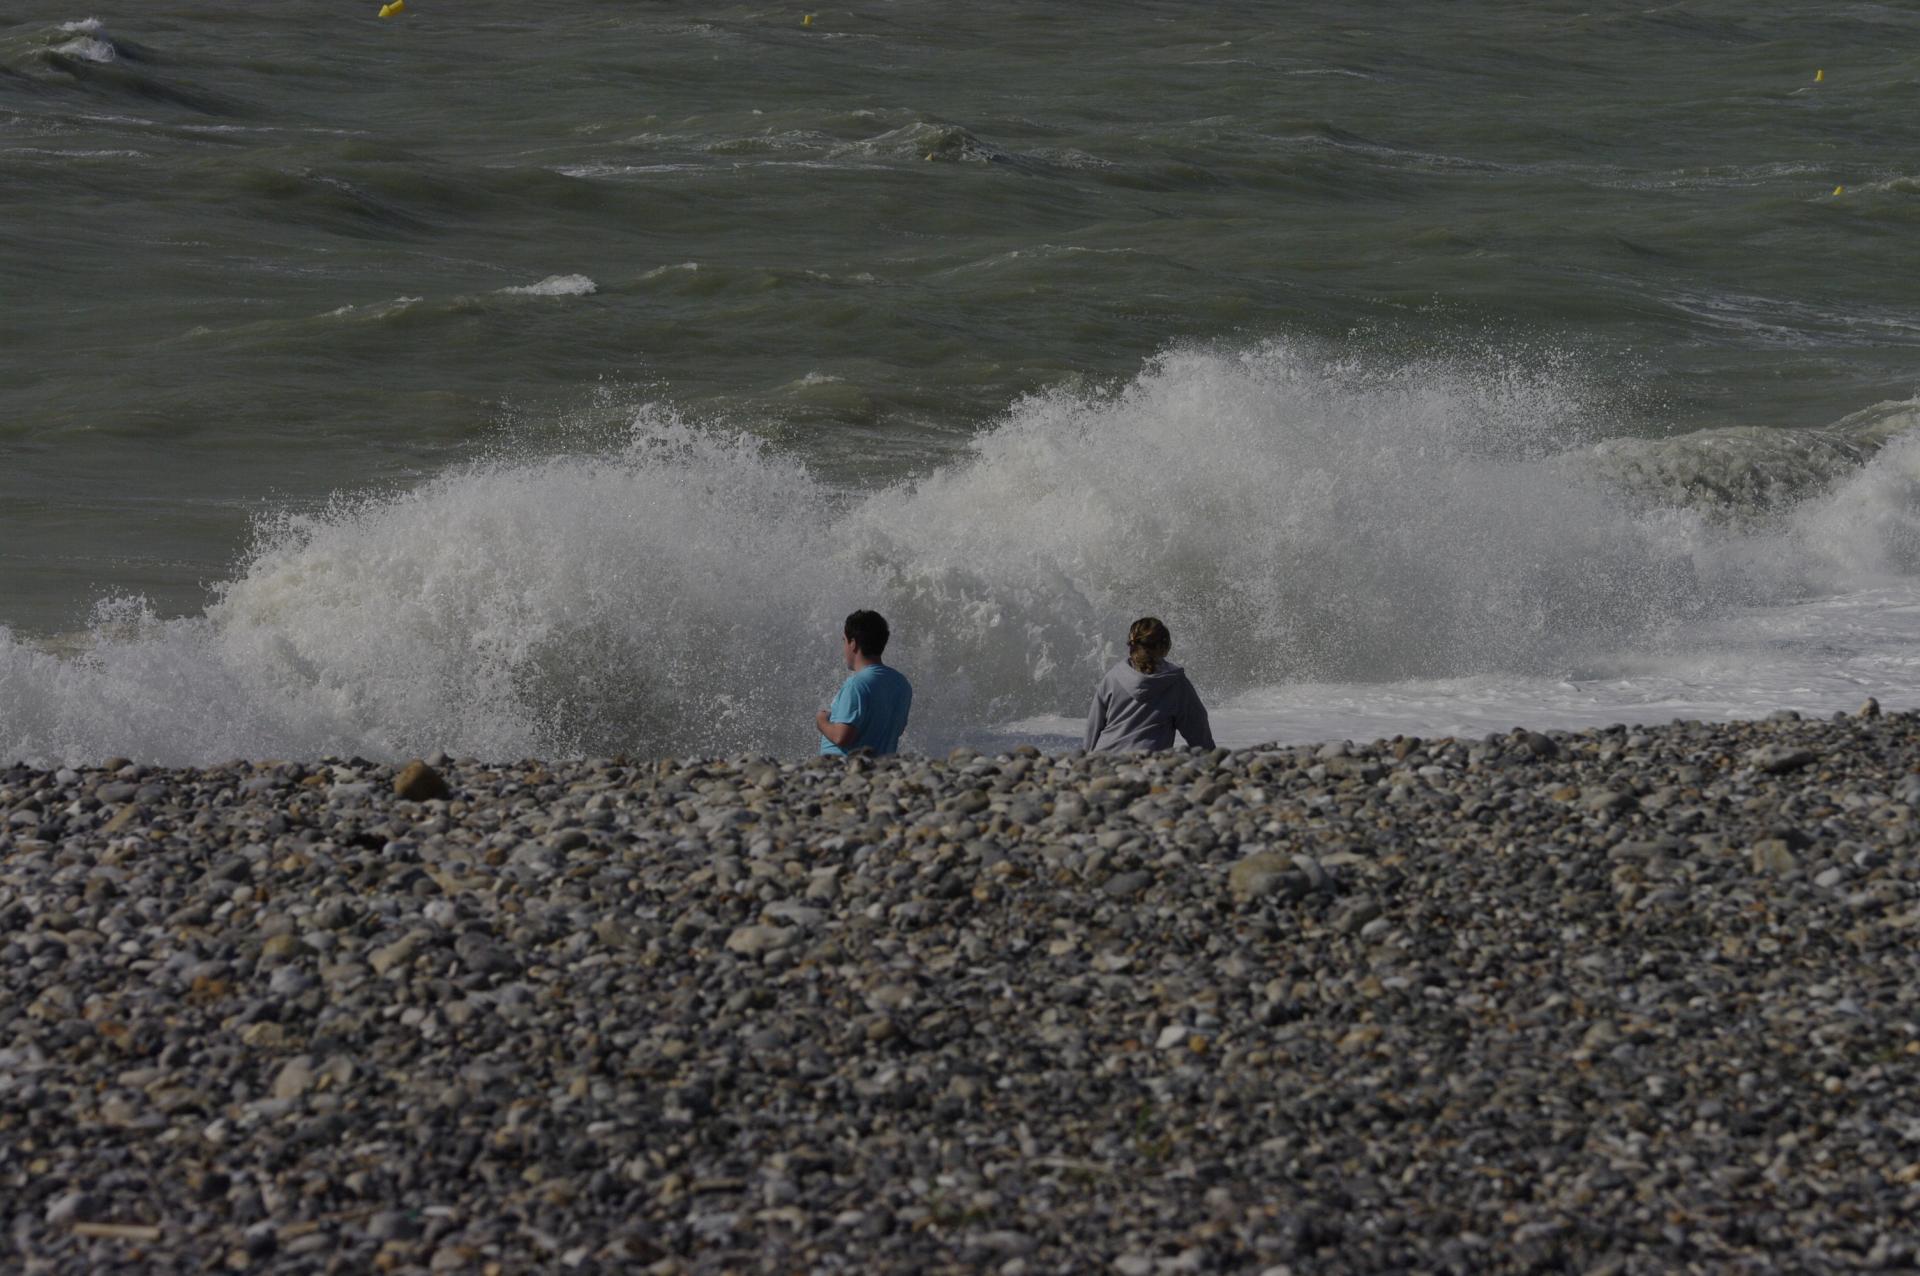 2015 07 25 cayeux sur mer demo 106